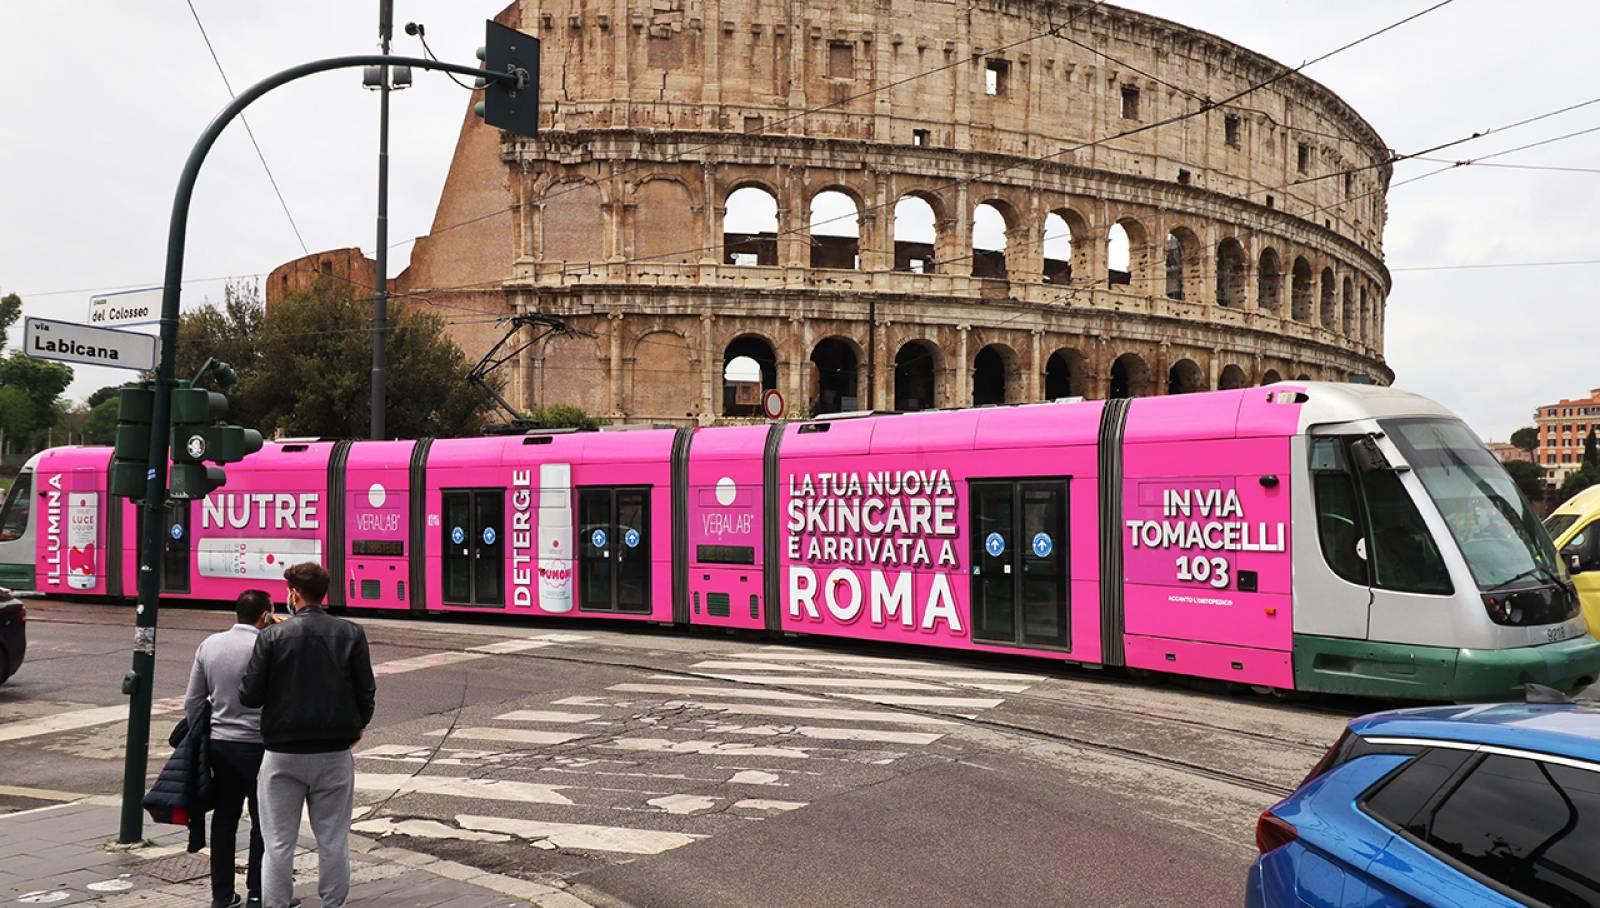 Pubblicità su tram IGPDecaux a Roma Full-Wrap per L'Estetista Cinica